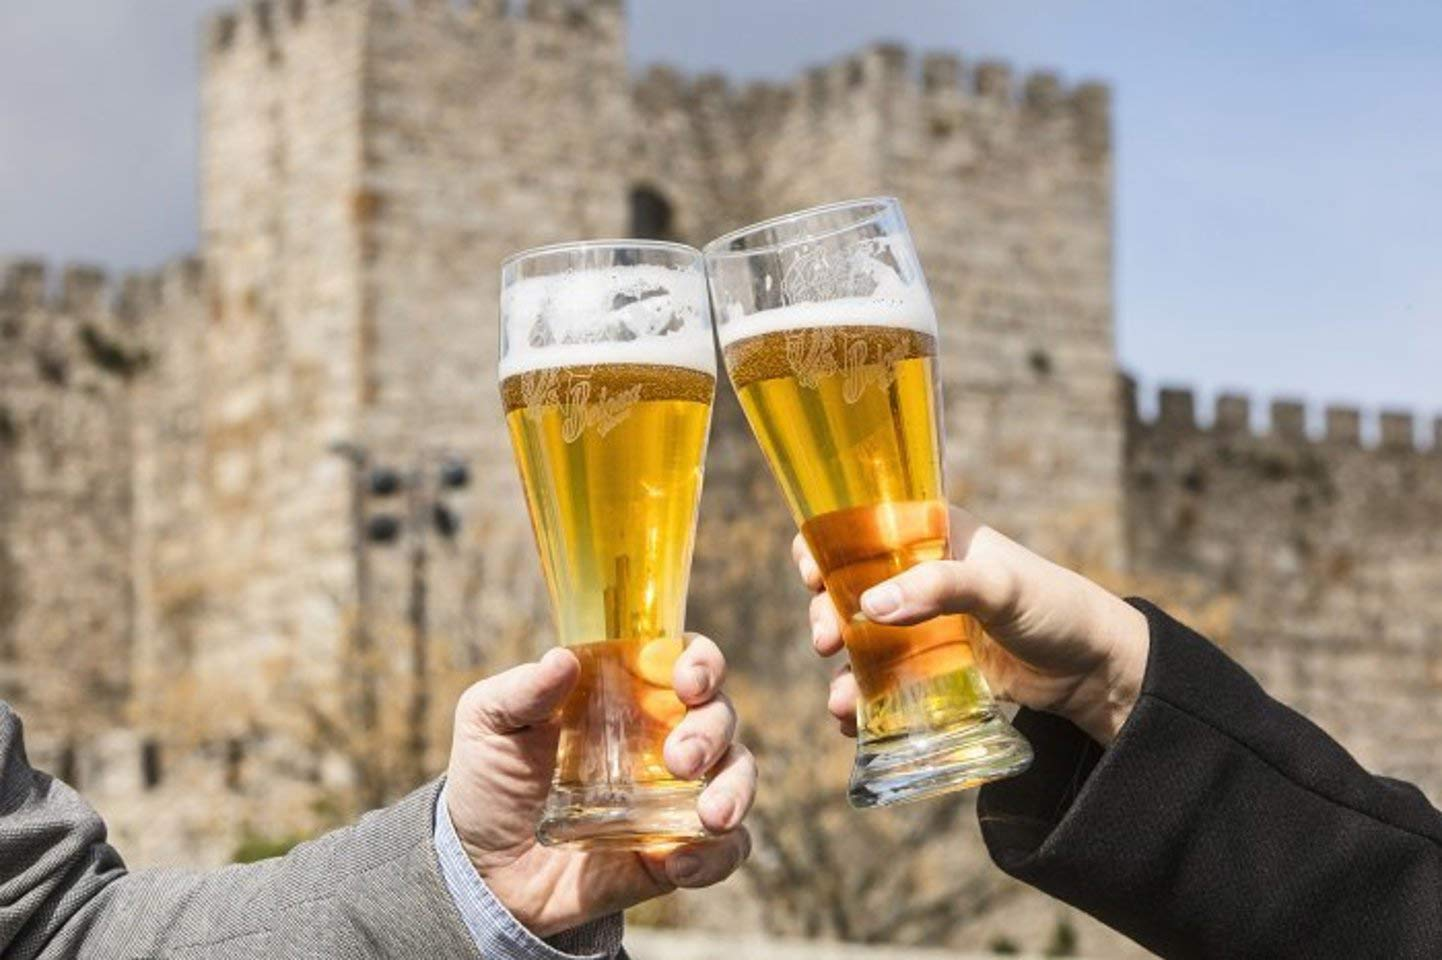 II Feria Internacional de la Cerveza Artesana de Trujillo (FICAT)